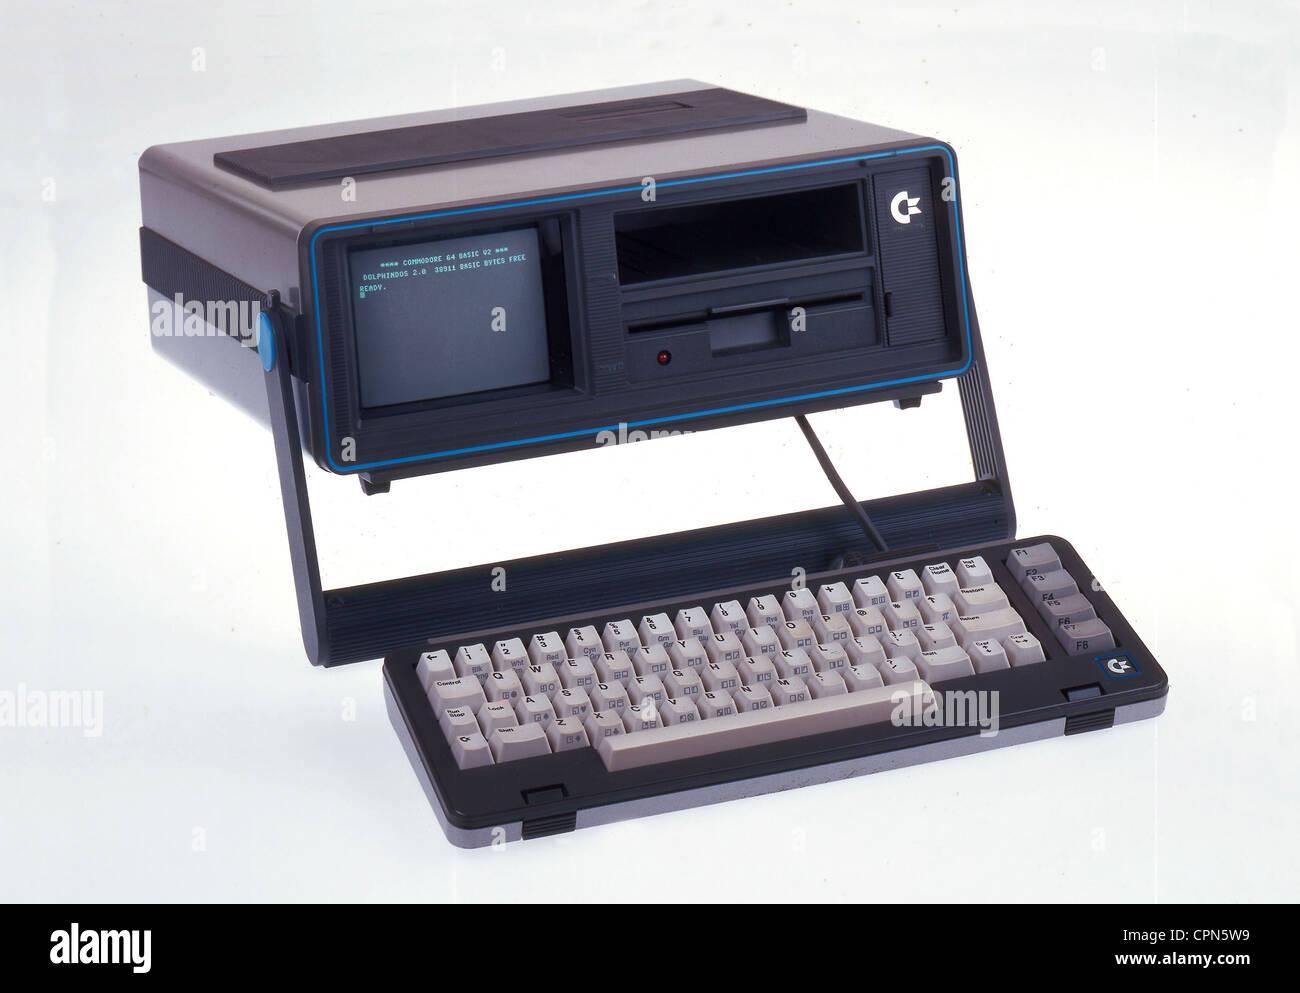 computing / electronics, computer, Commodore executive